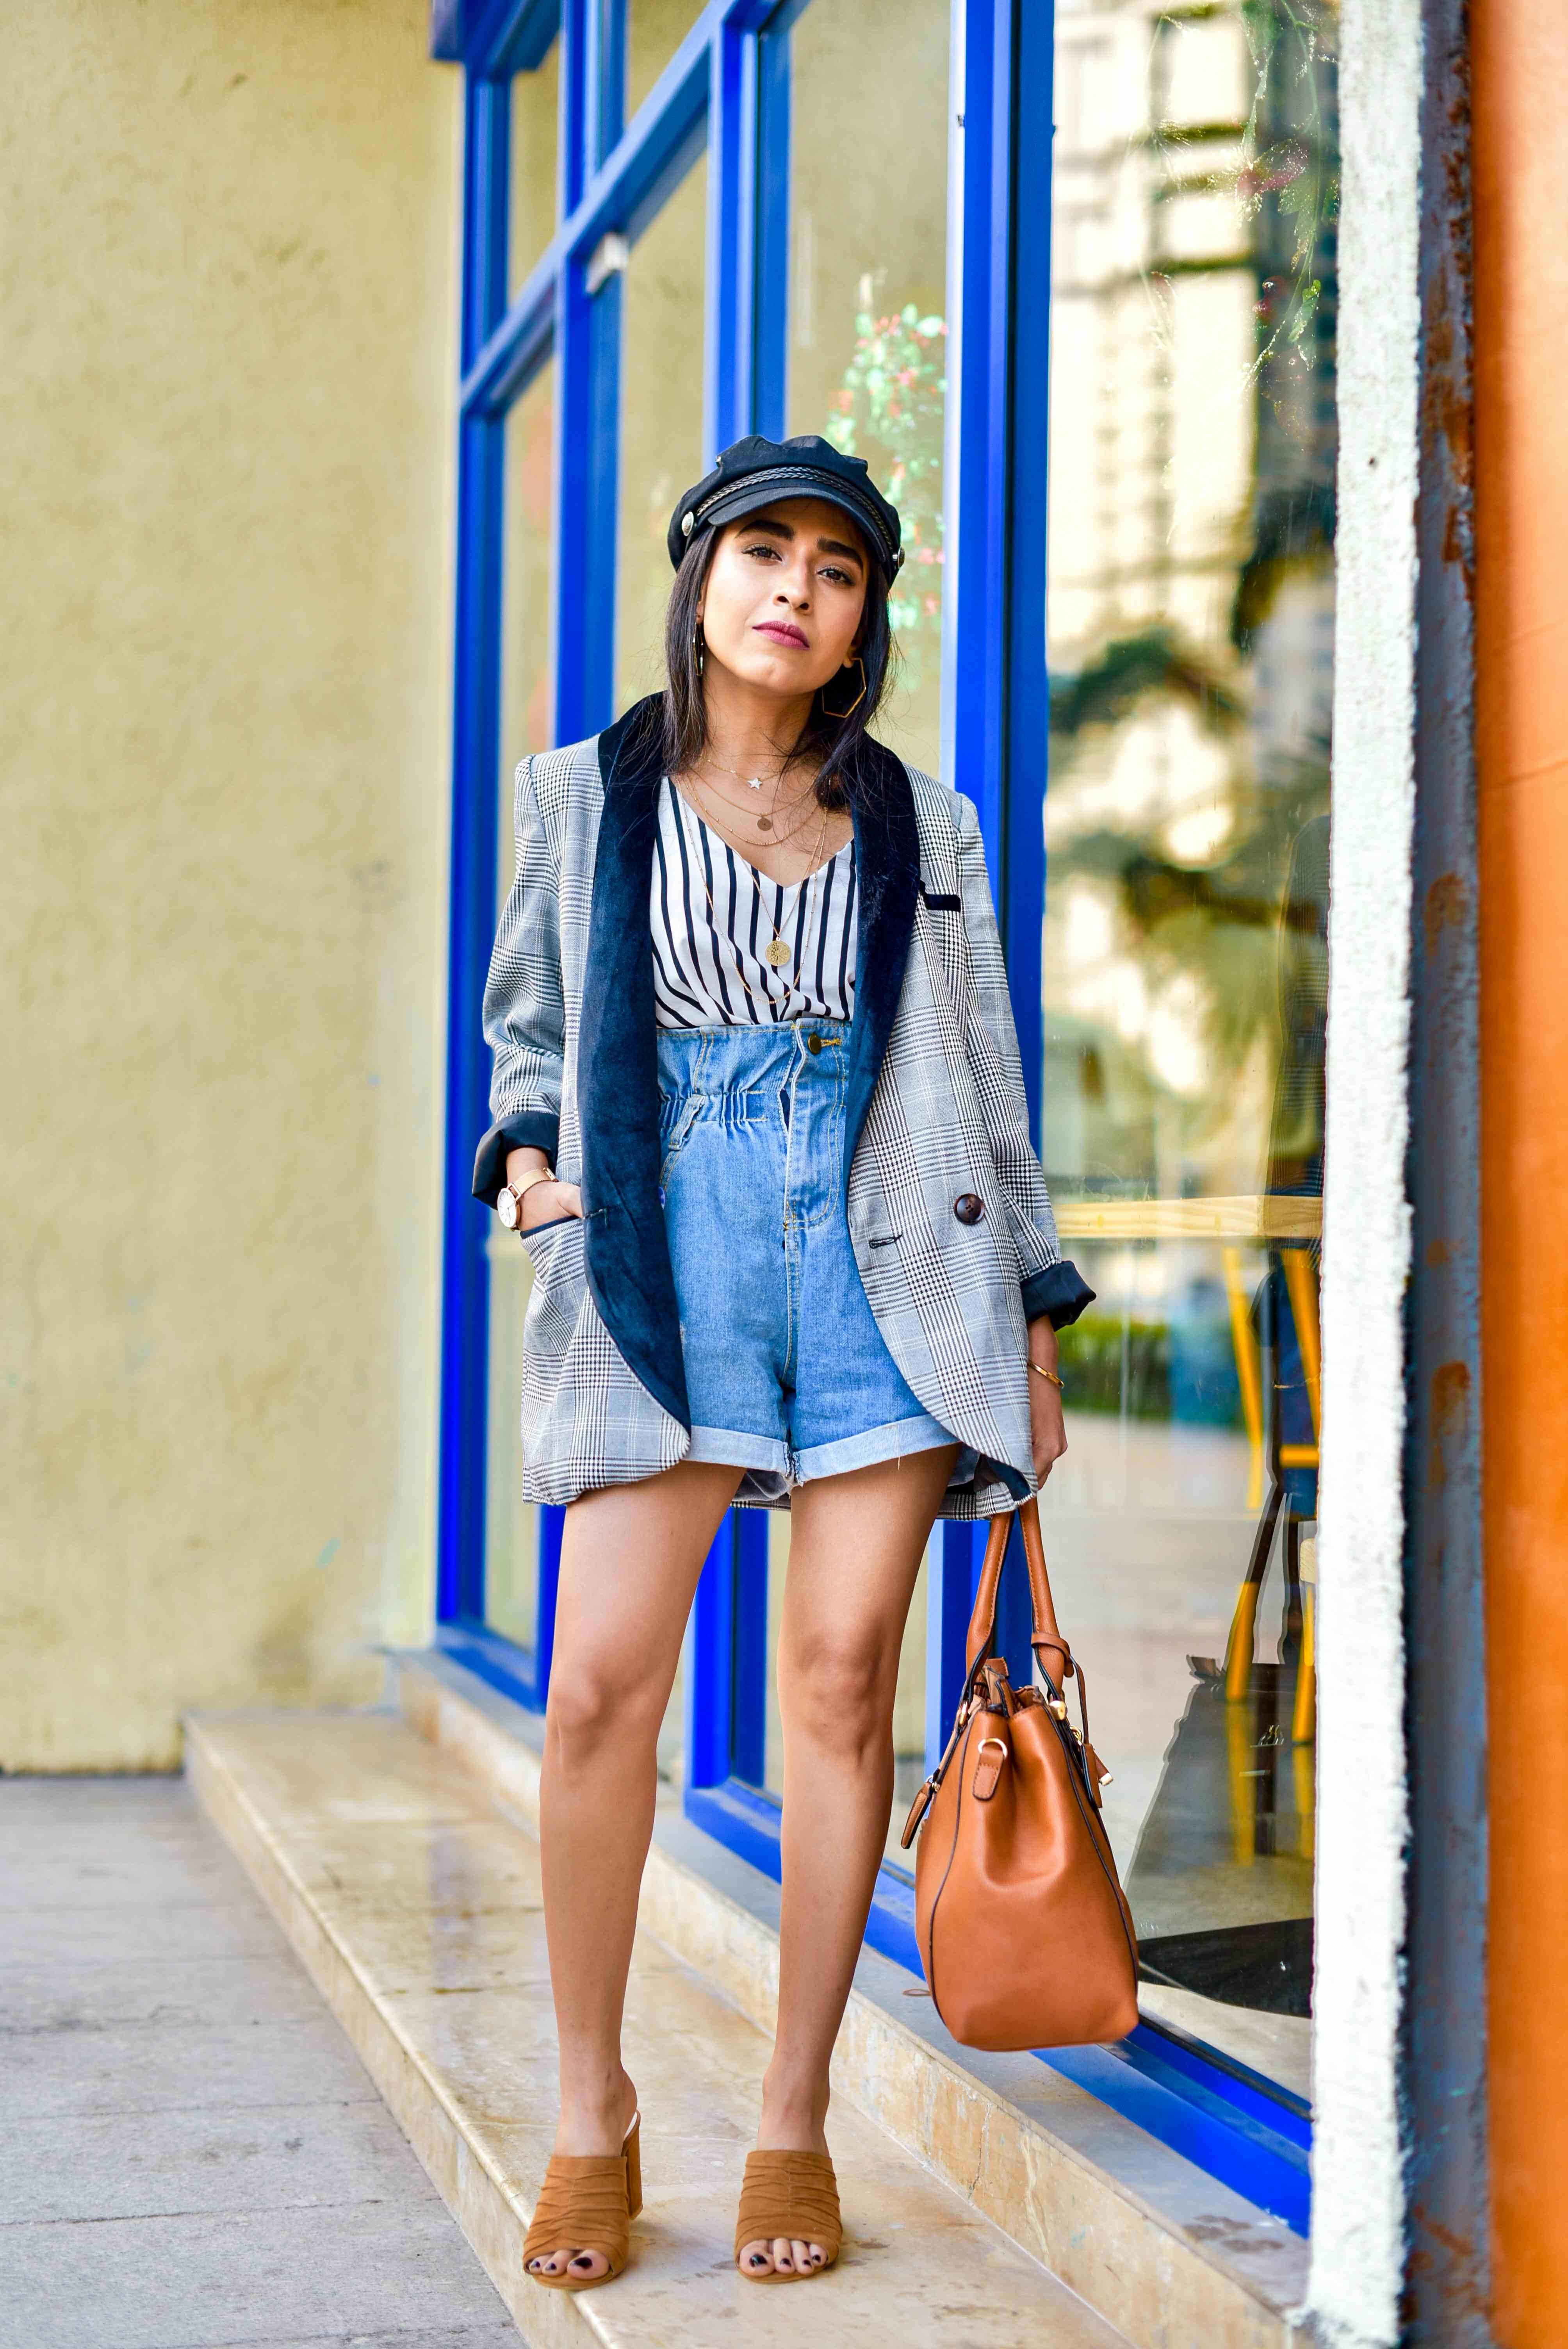 plaid blazer, checks & stripes, black & white, monochrome outfit, ootd, denim shorts, tan accessories, shein, romwe, indian fashion, lakme fashion week, indian street style, blazer outfit, casual blazer outfit,